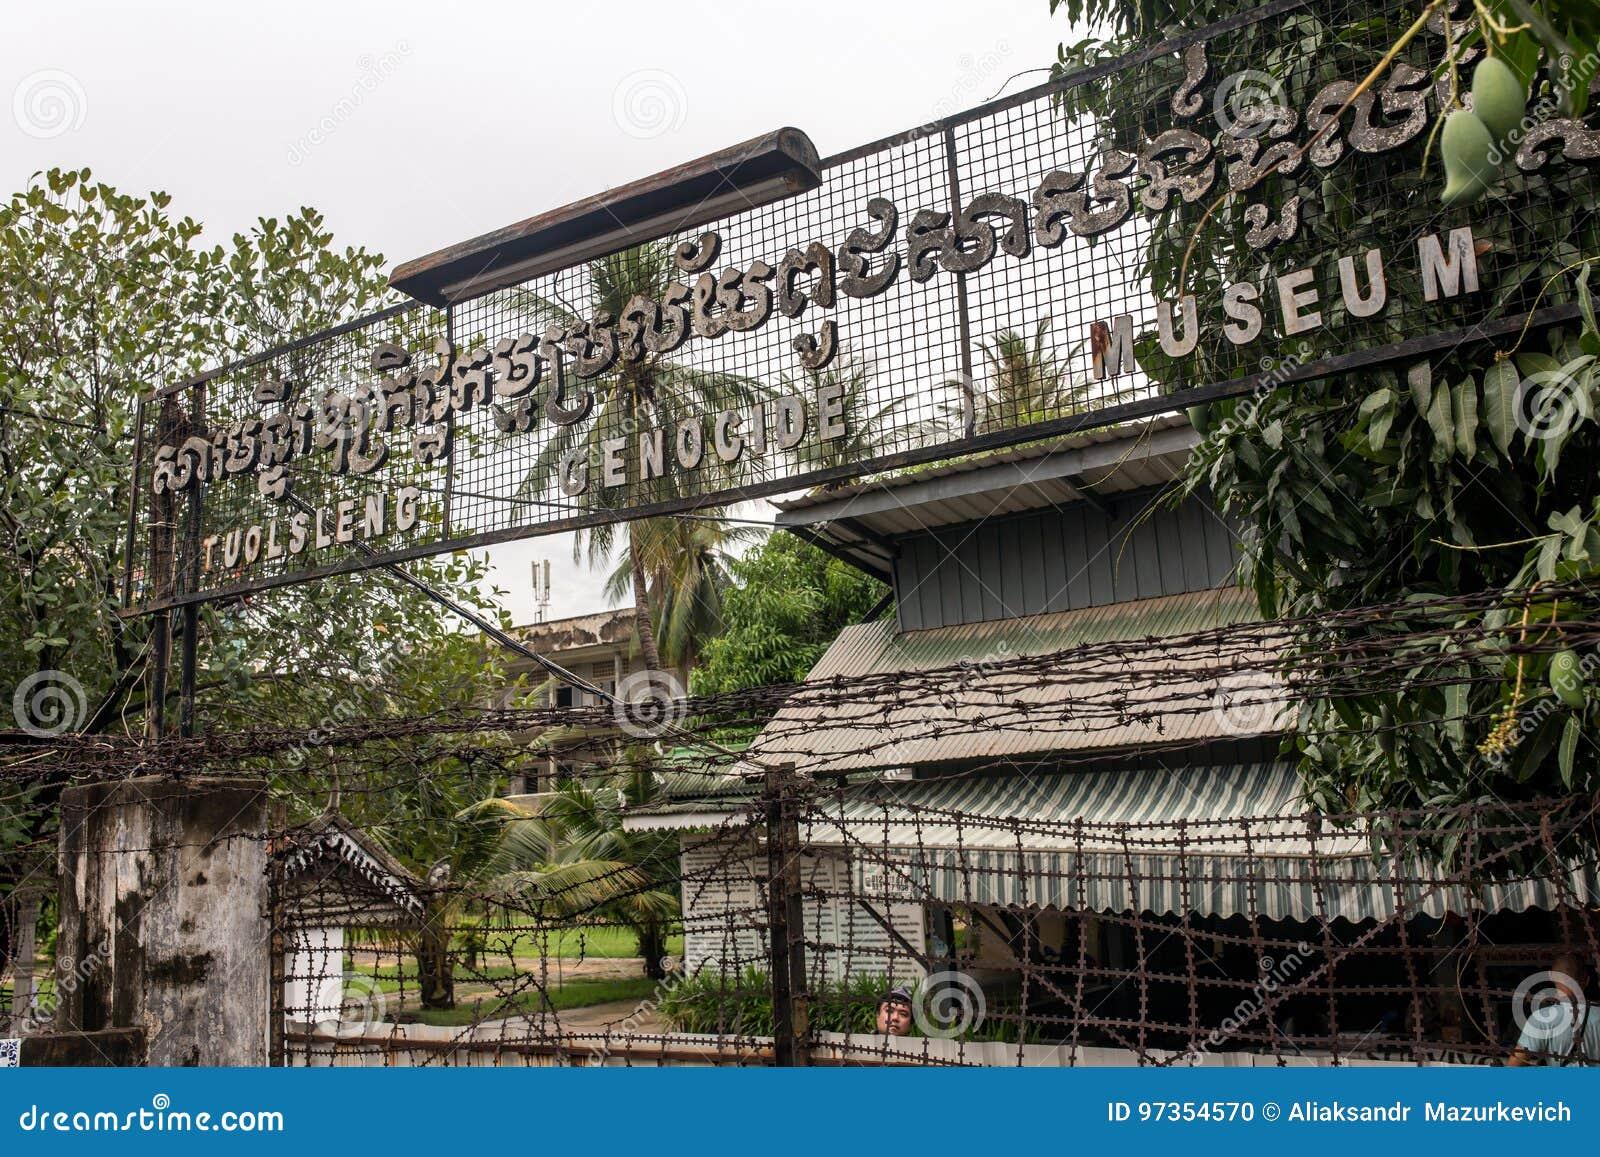 Tuol Sleng种族灭绝博物馆在金边,柬埔寨